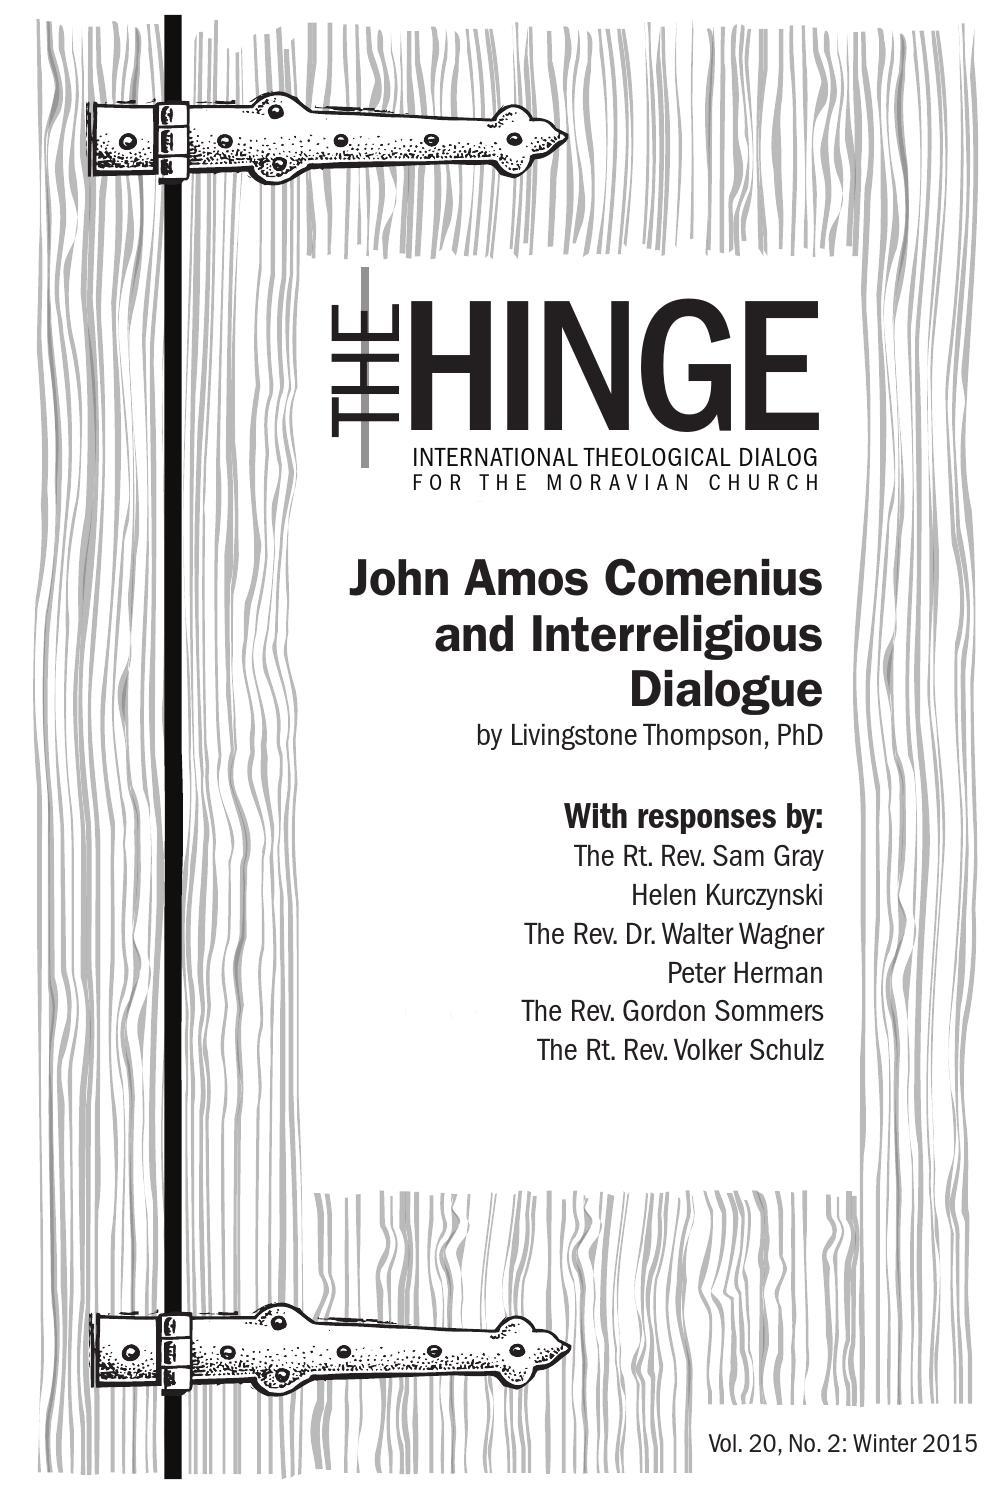 Hinge 20.2: John Amos Comenius & Interreligious Dialogue